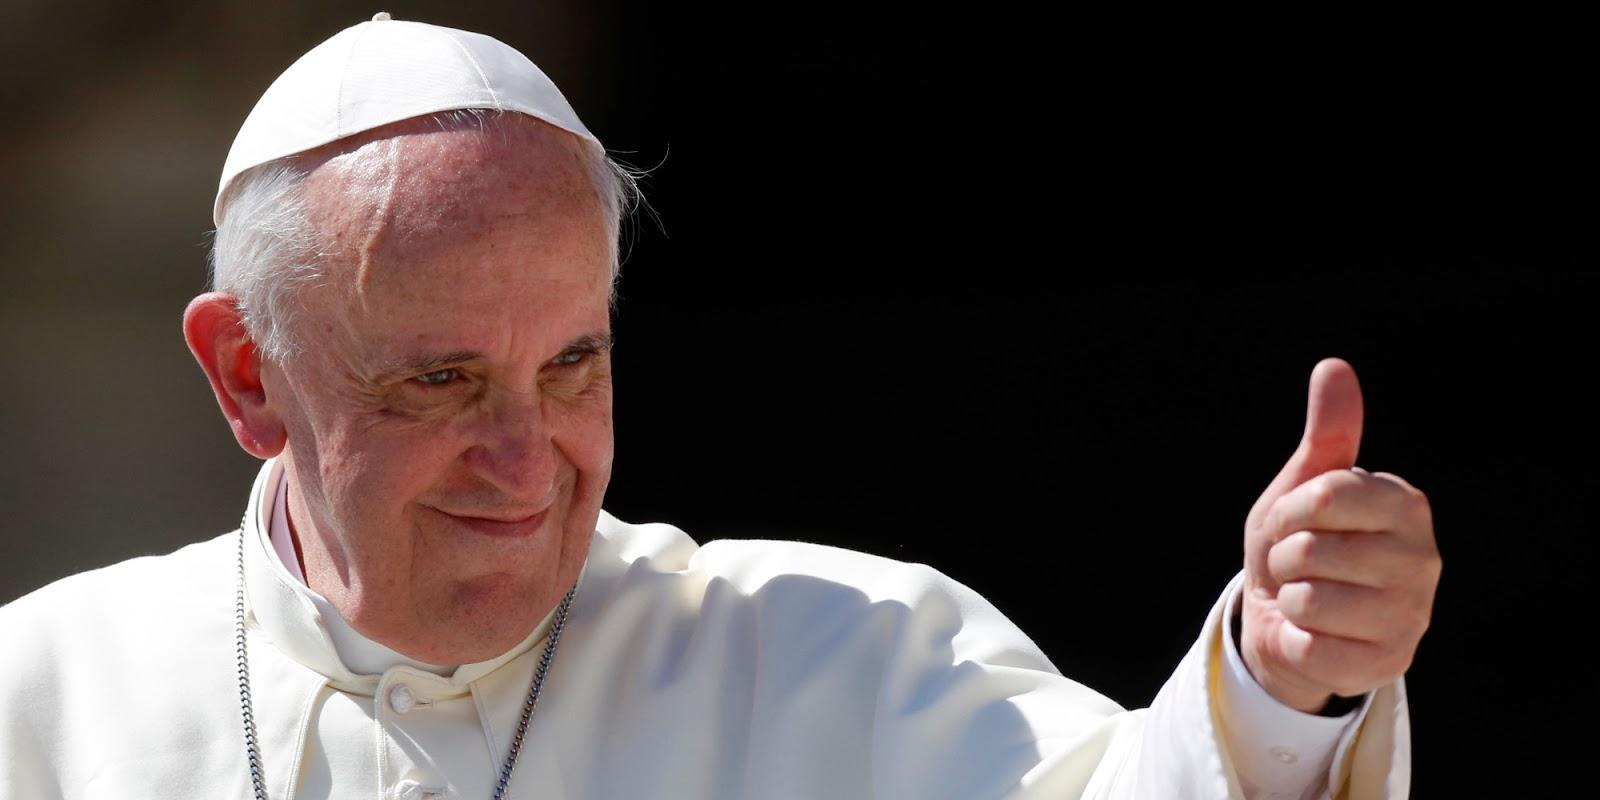 Lamborghini assinada pelo Papa é leiloada por 715 mil euros